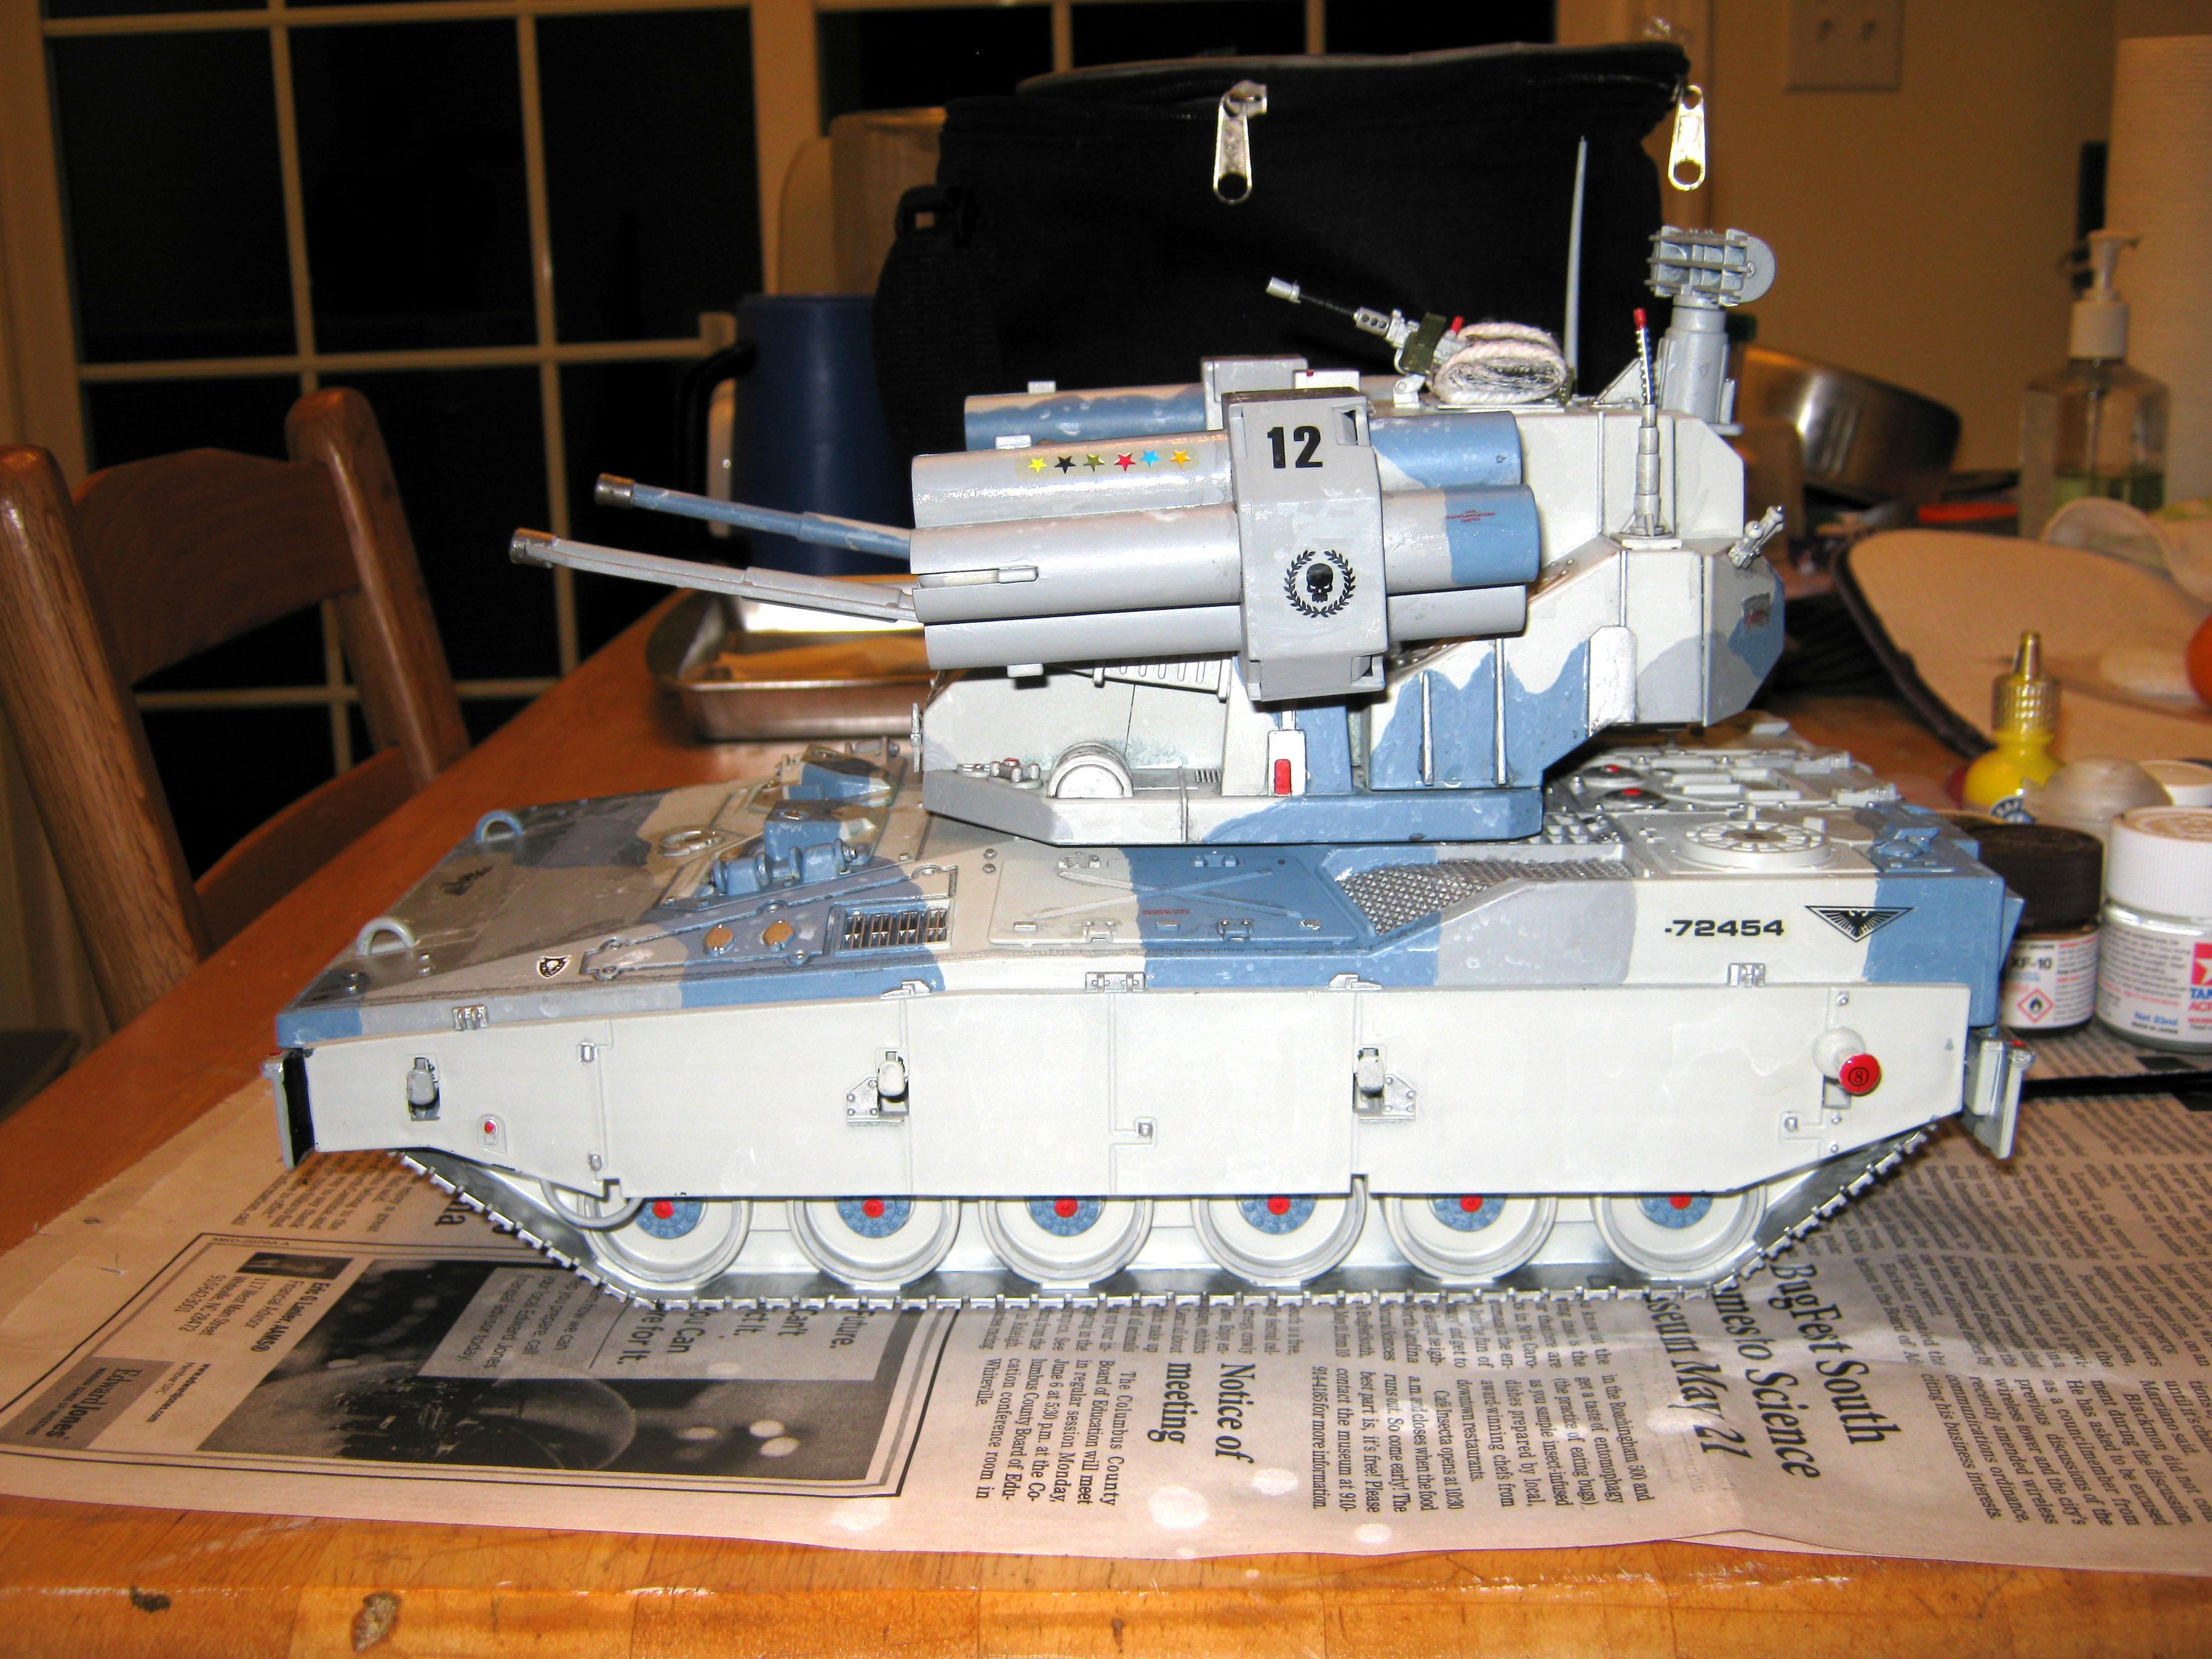 Adv, Afv, Air Defense Vehicle, Anti-aircraft, Artillery, Conversion, G.i. Joe, Imperial, Self Propelled, Super-heavy, Tank, Toy